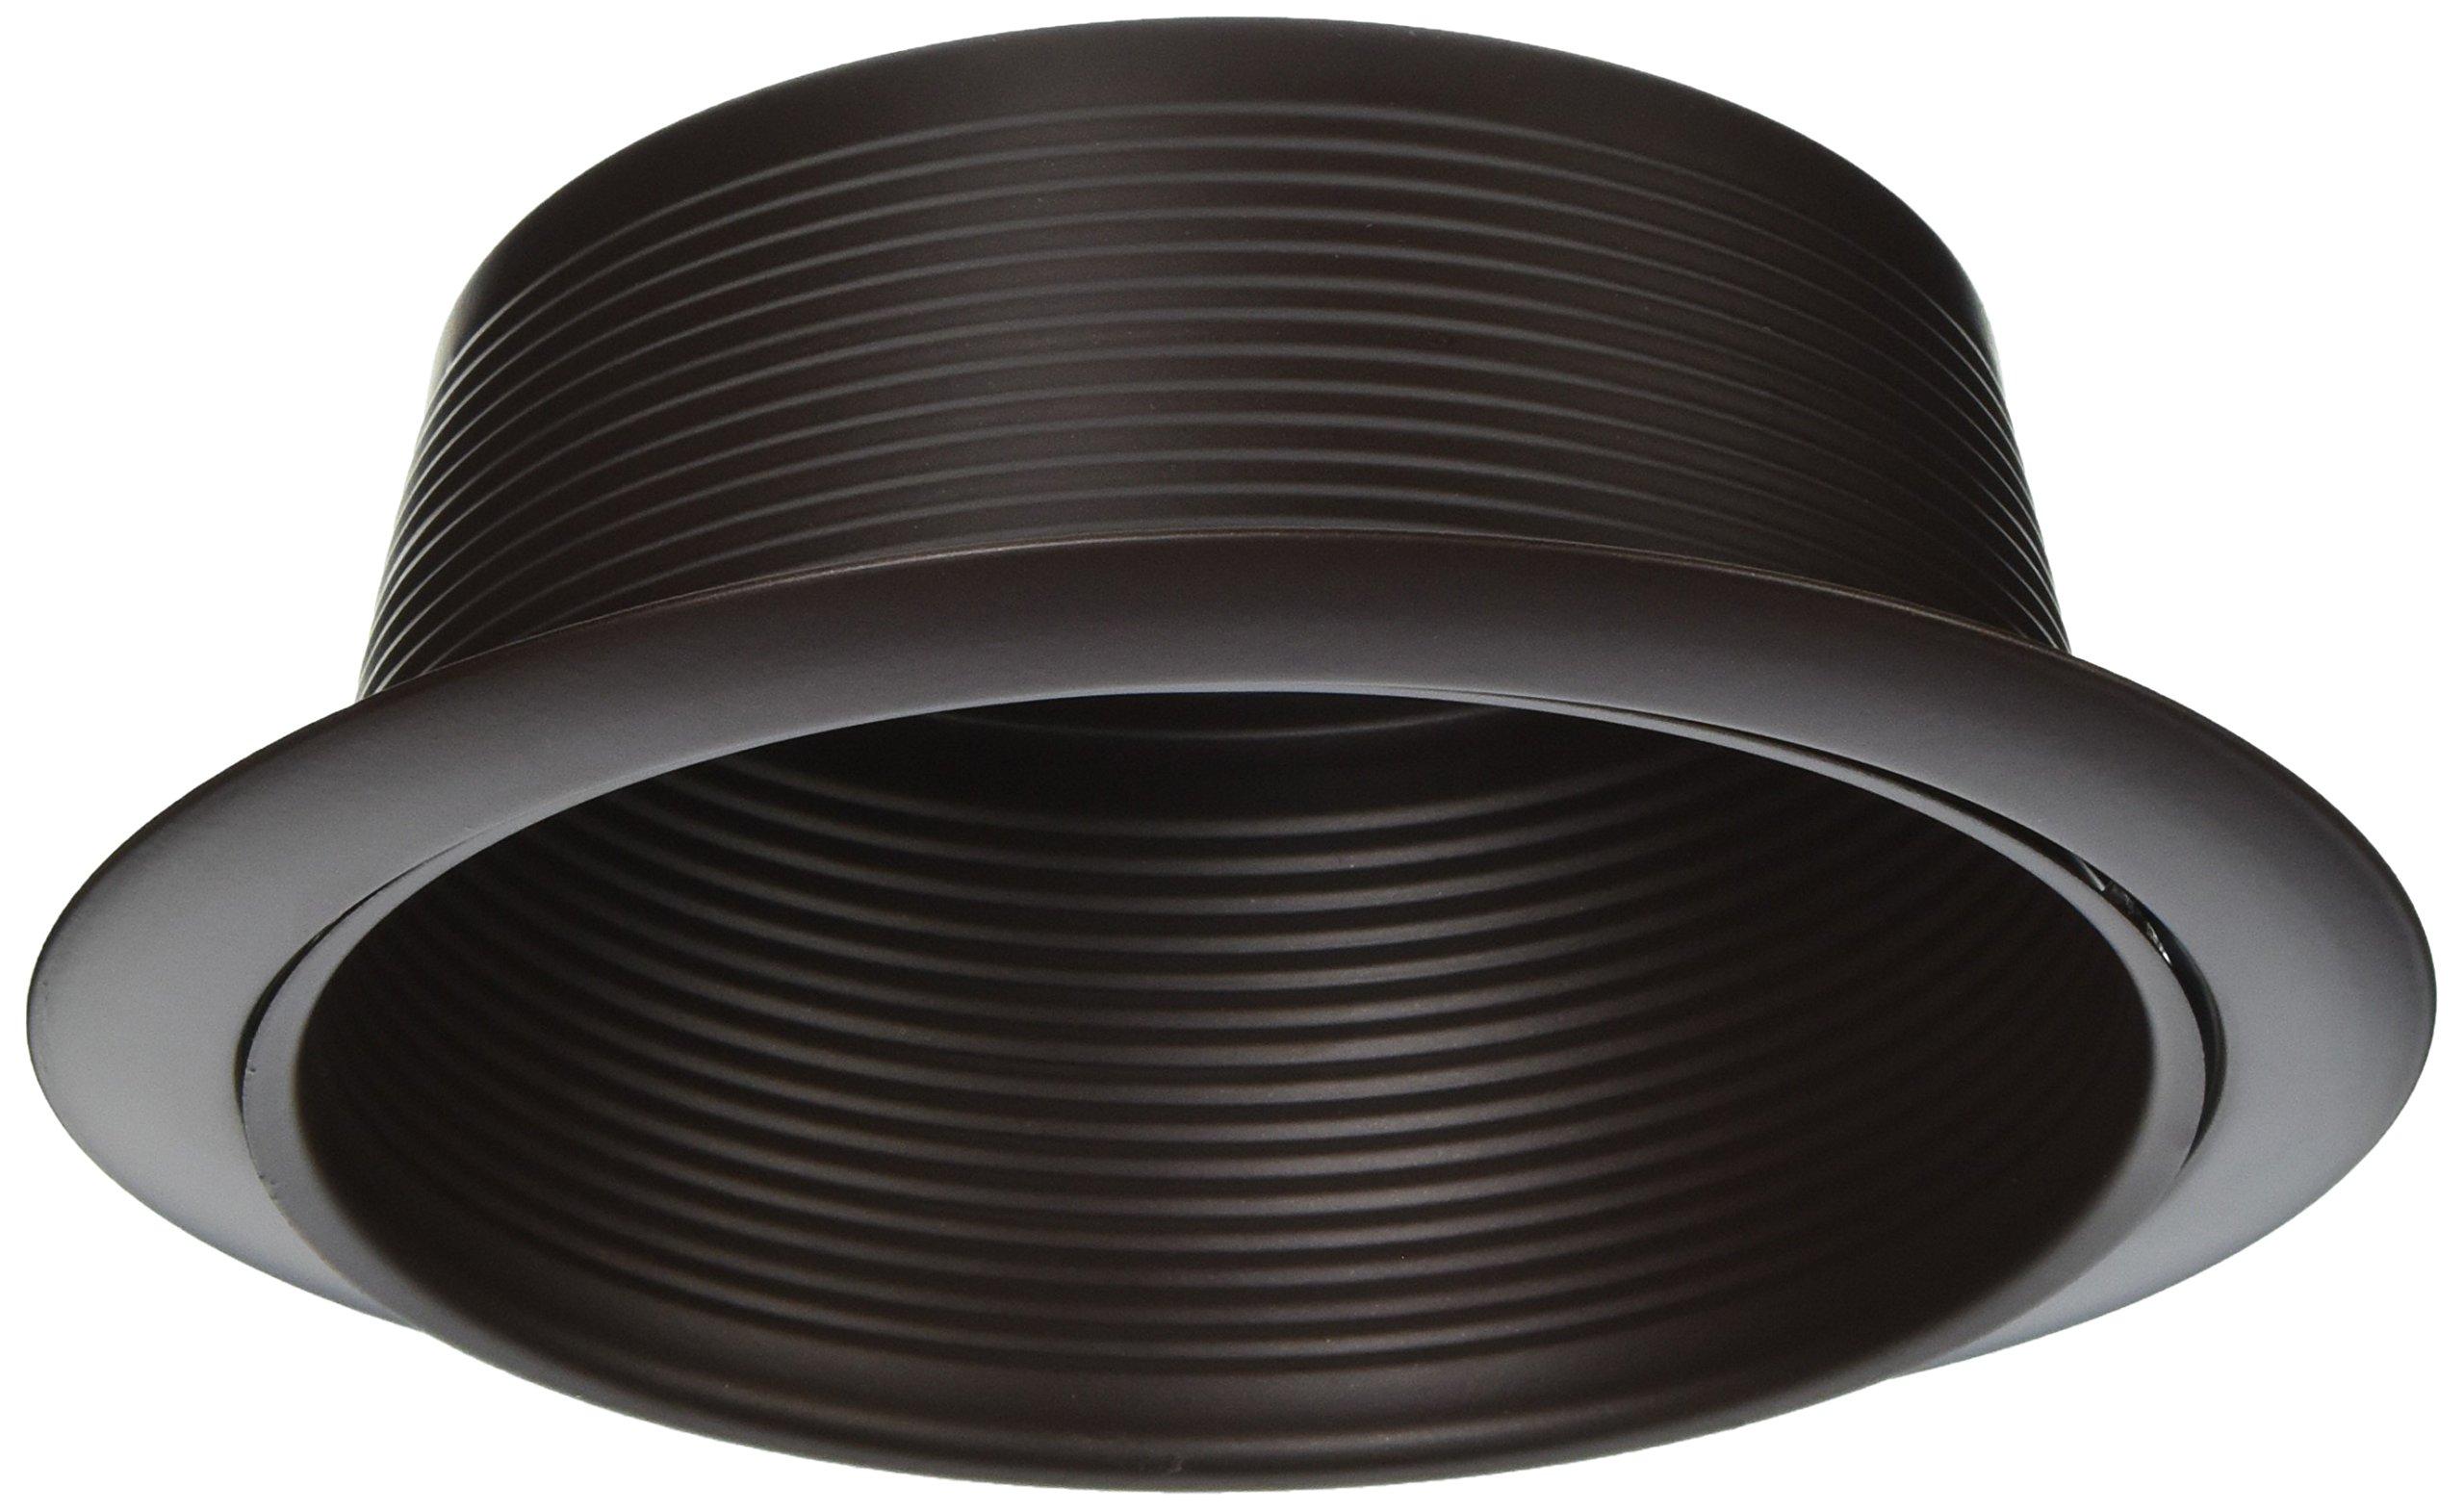 NICOR Lighting 6-Inch Baffle Lighting Trim, Oil-Rubbed Bronze (17510OB-OB)